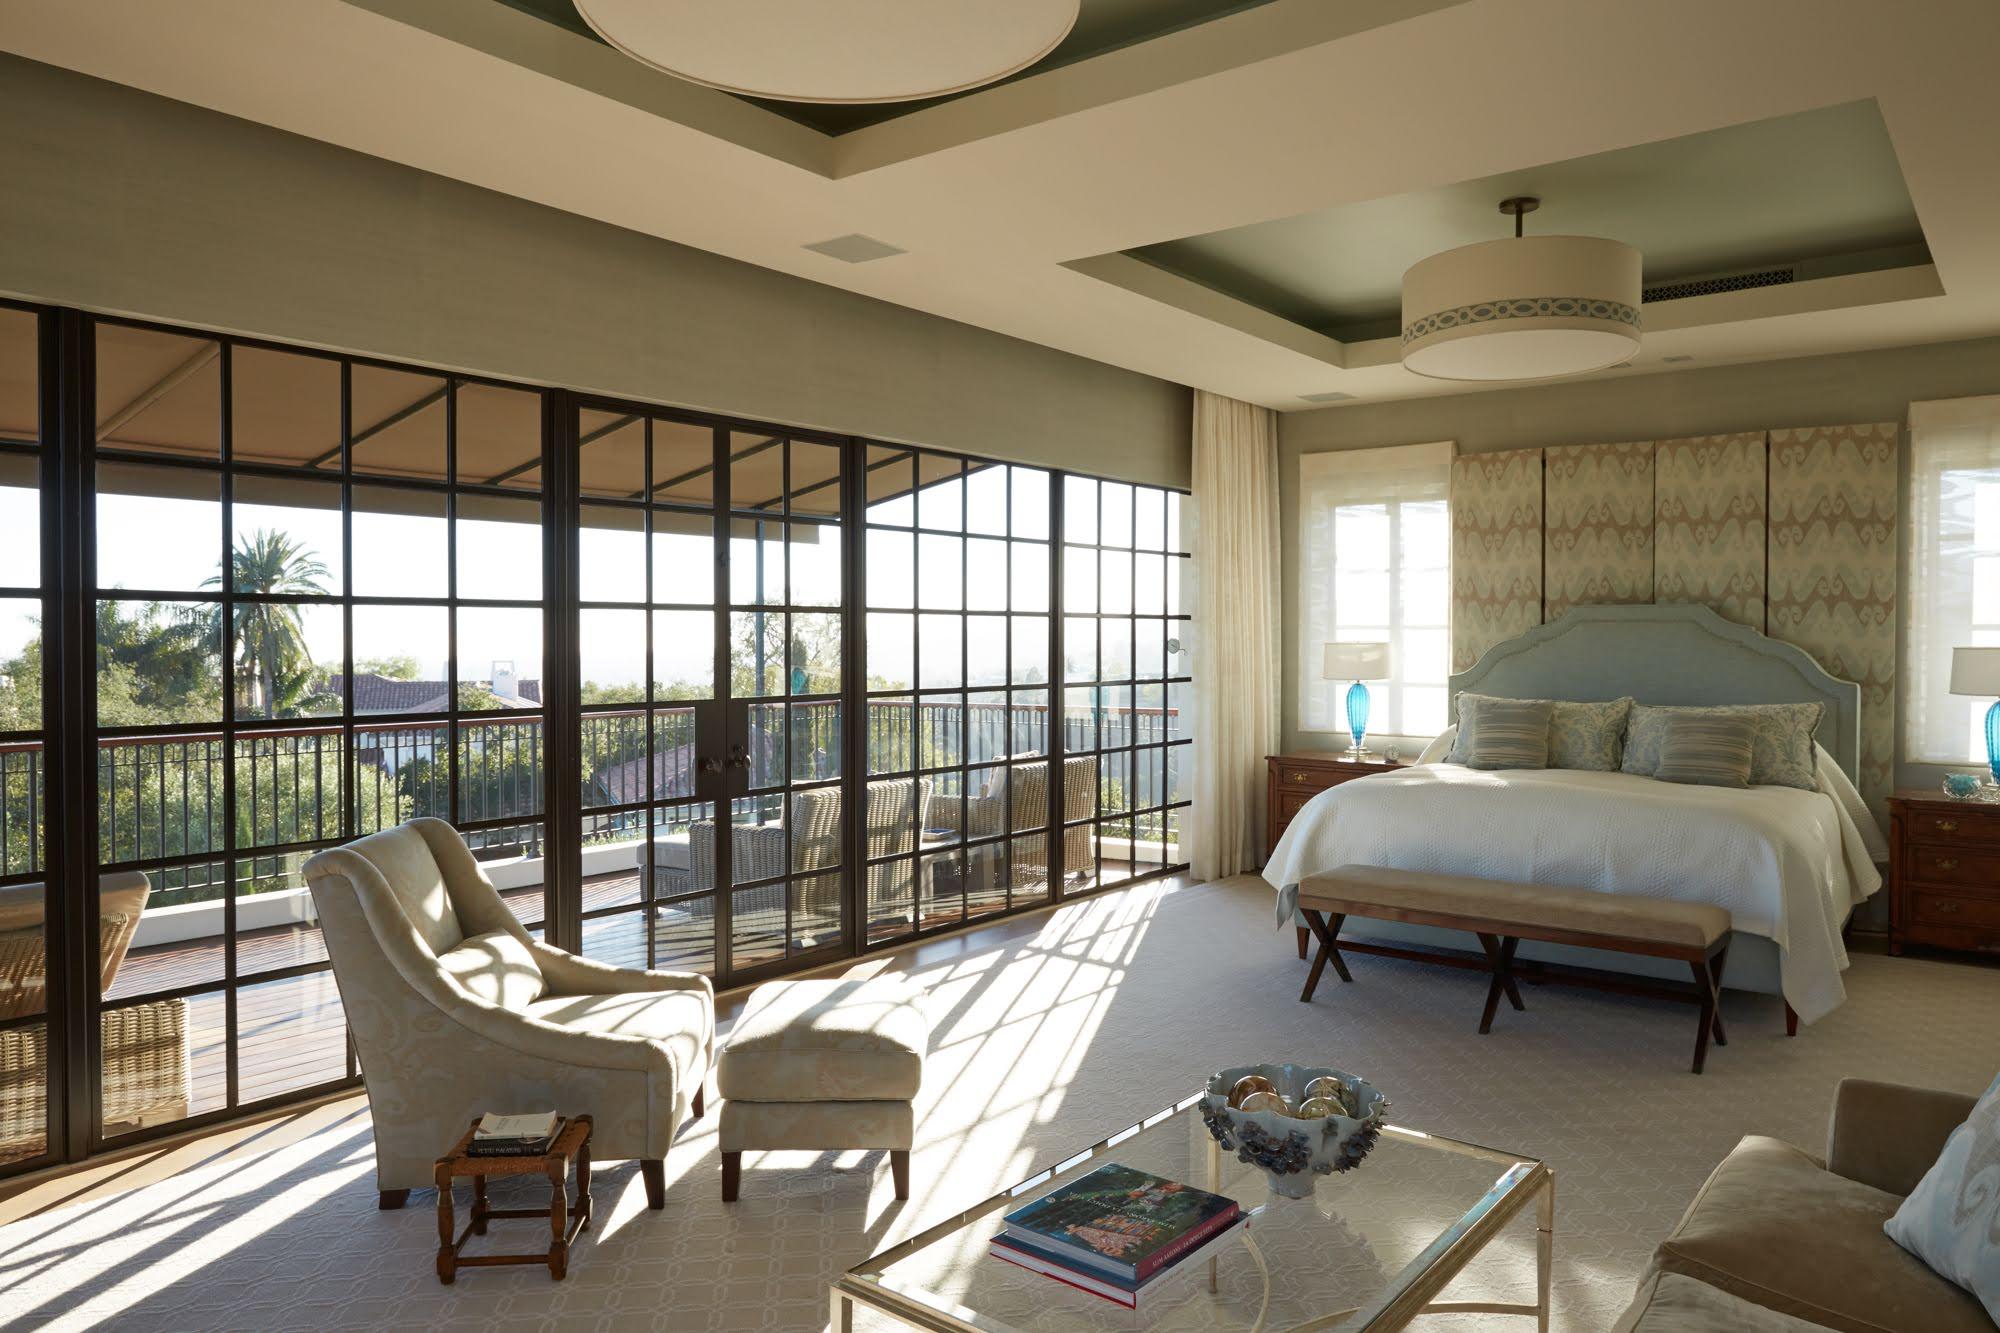 William_Hefner_beverly_crest_projects_Barnett__BR__bedroom_01__Master__wide